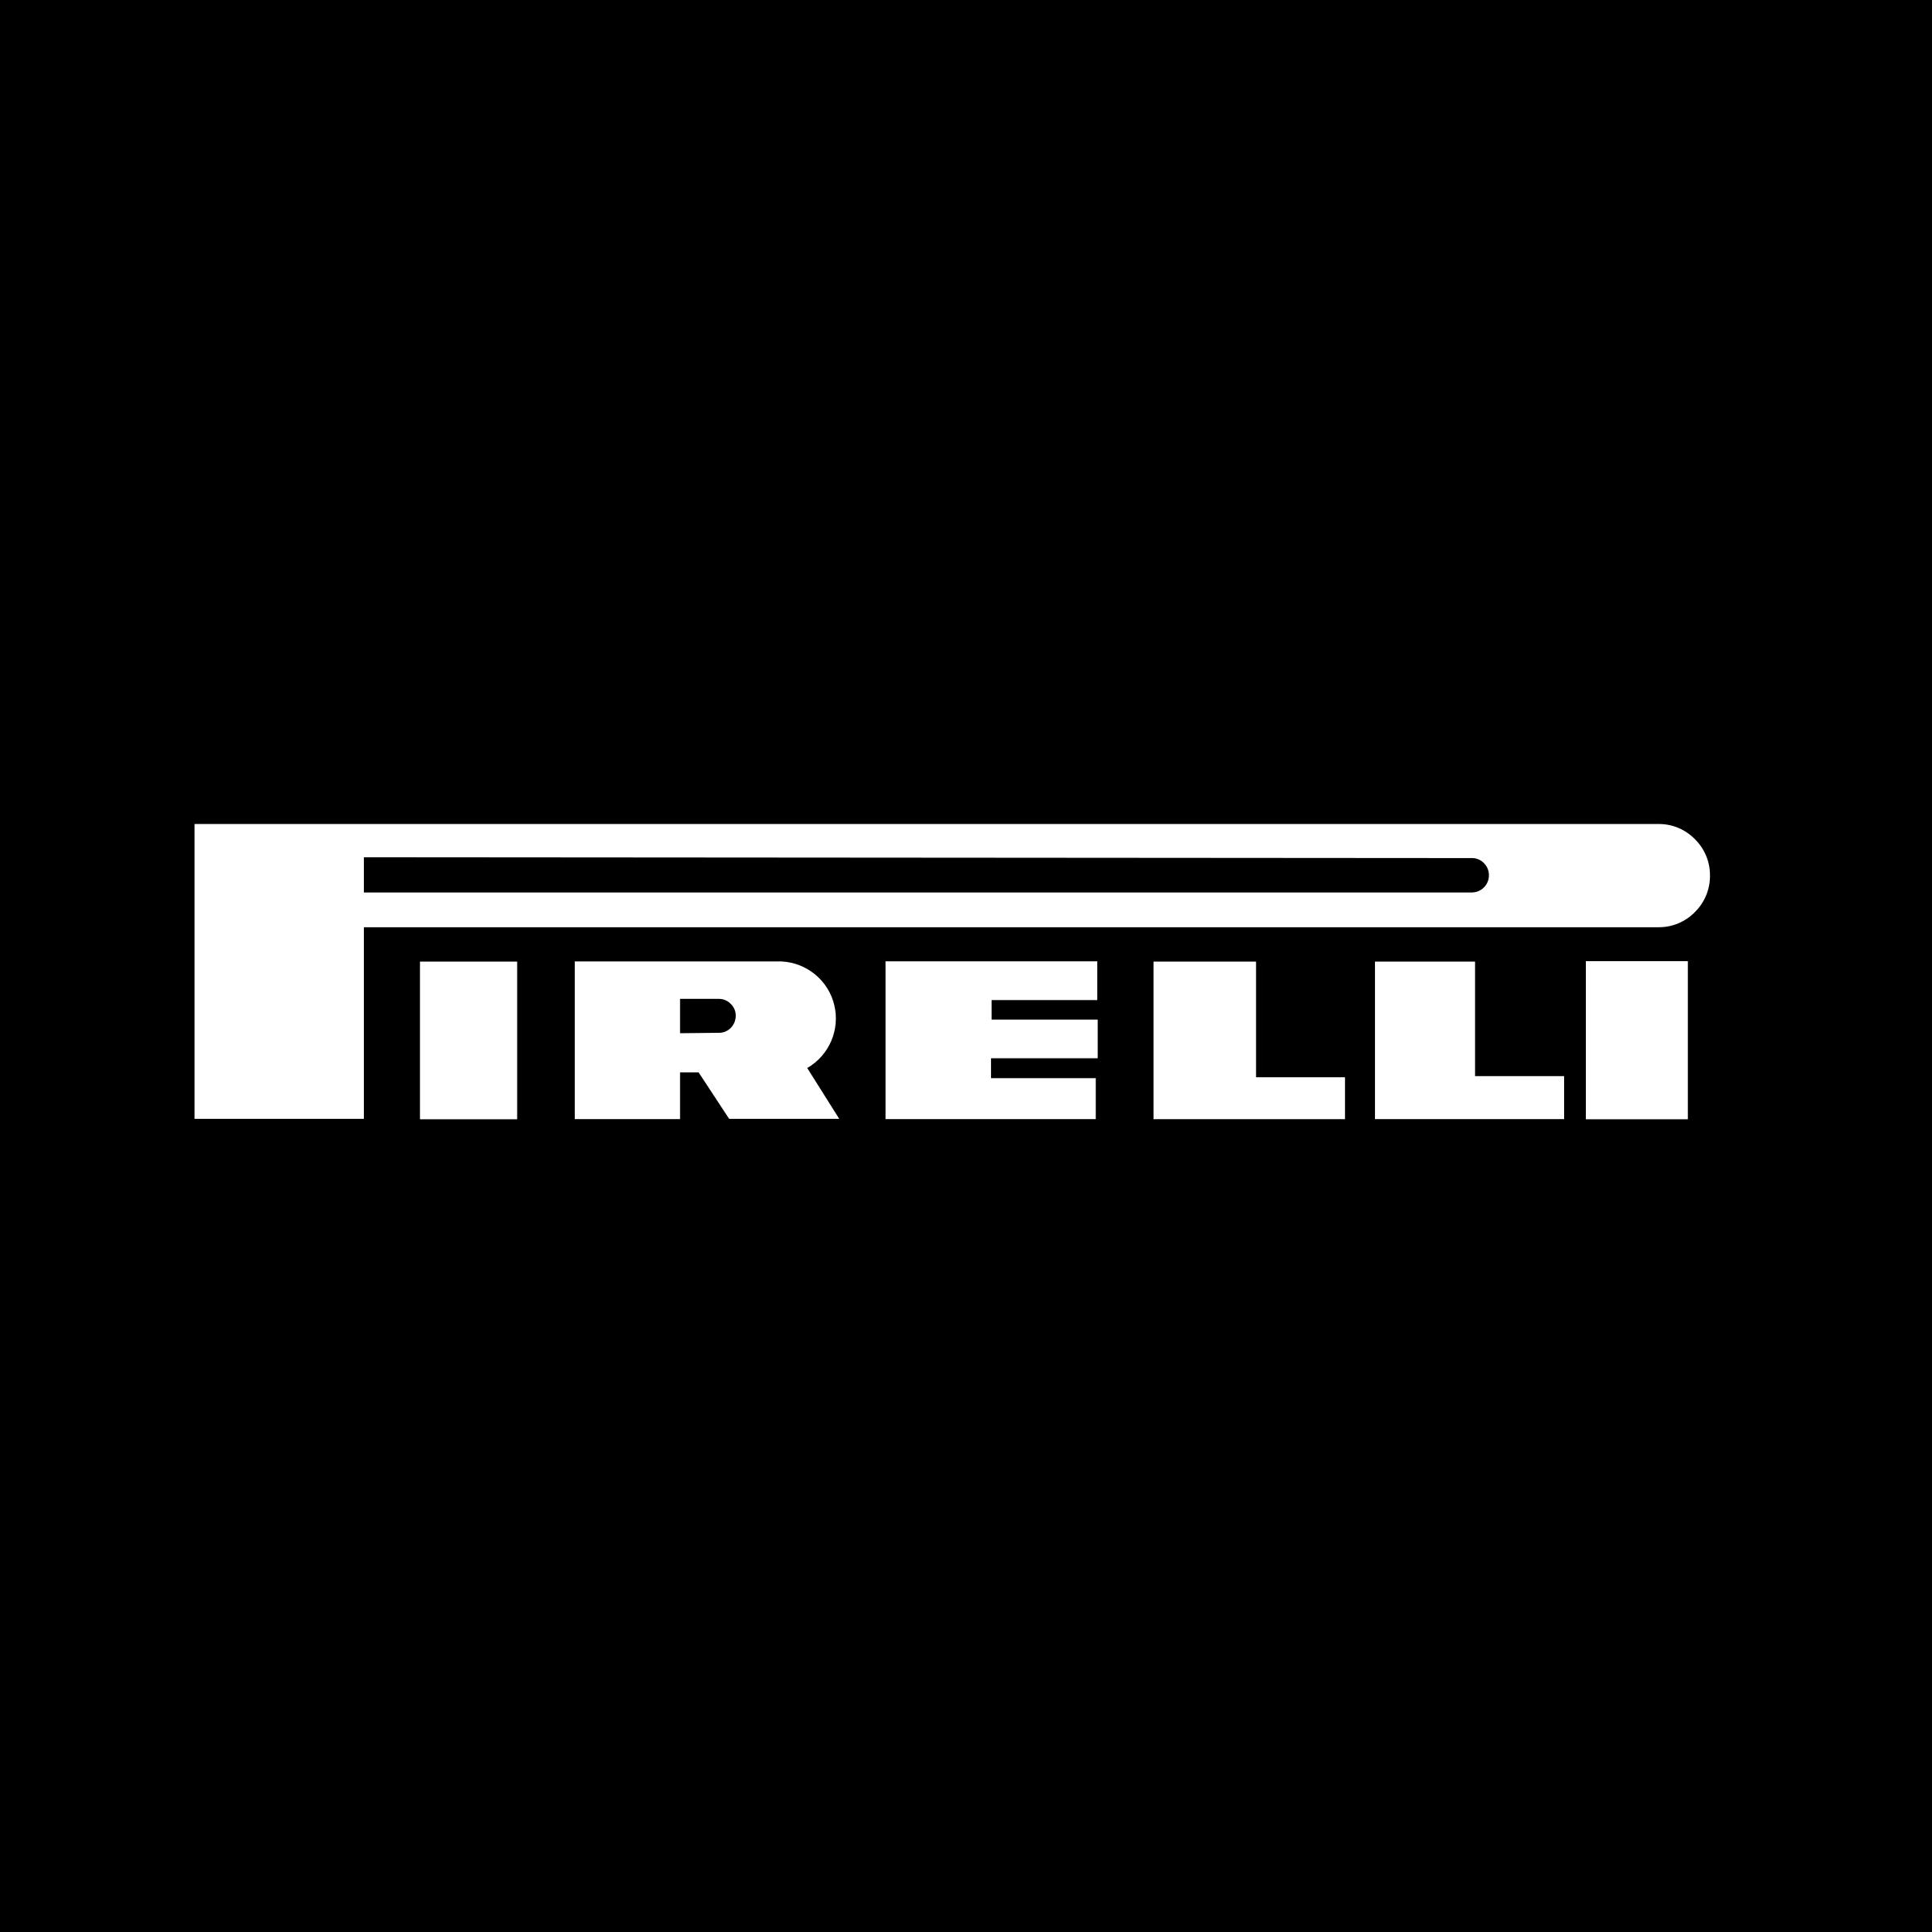 Pirelli Logo PNG Transparent & SVG Vector.